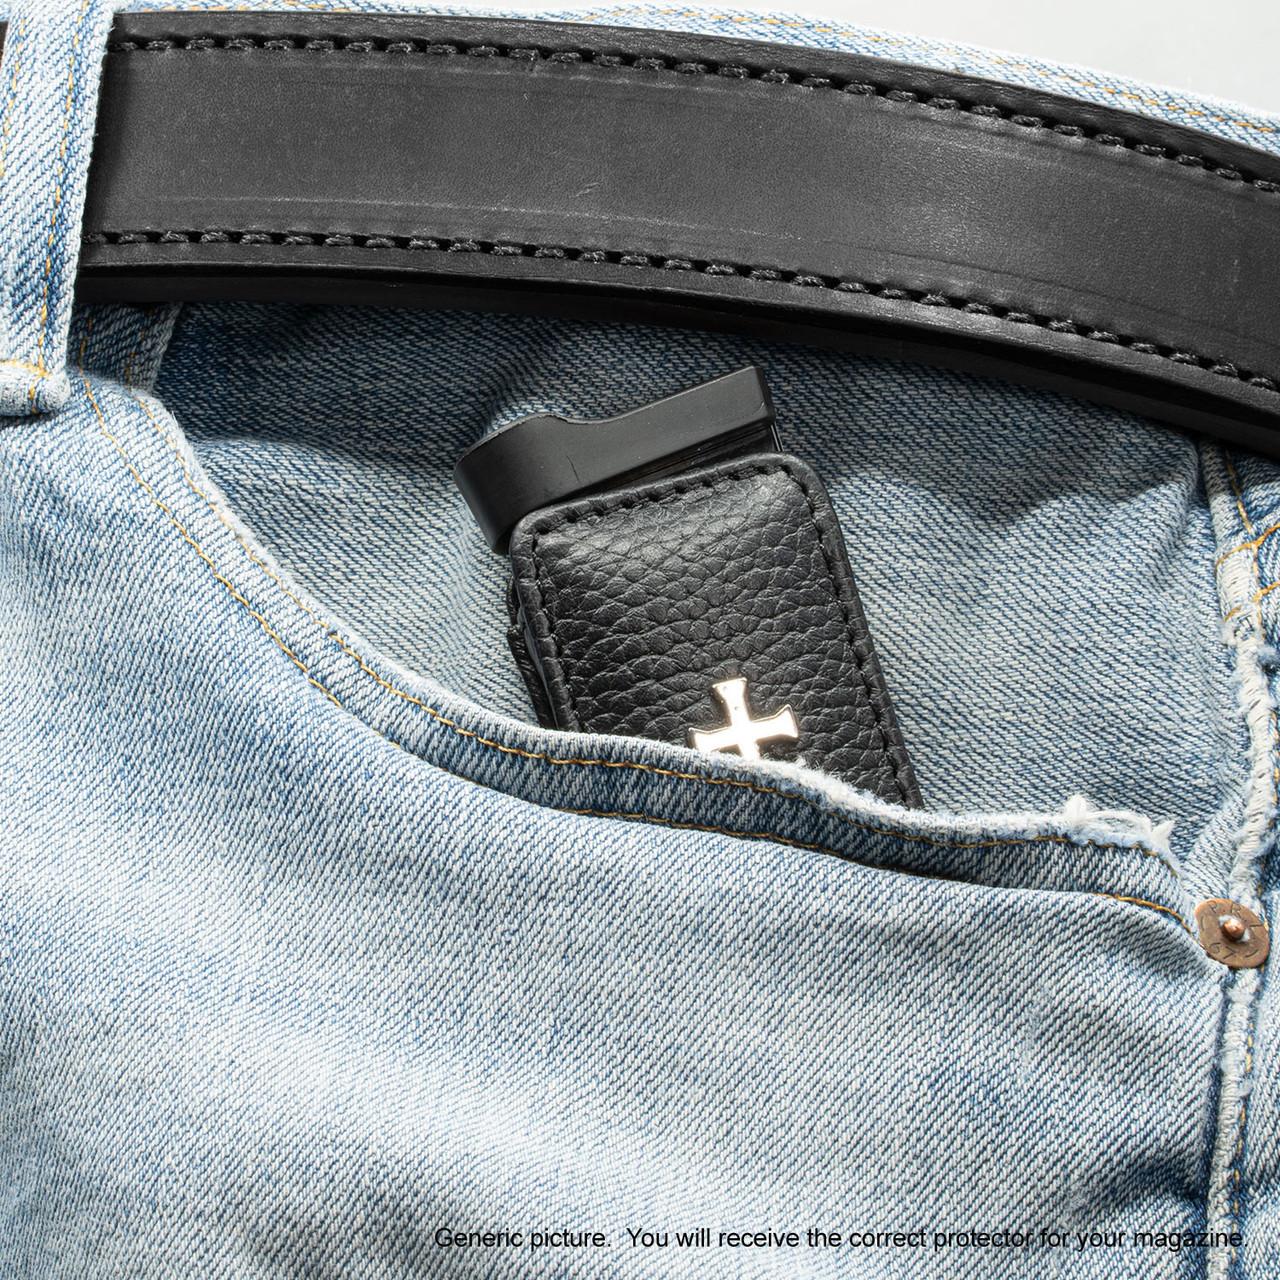 CZ 2075 Rami Black Leather Cross Magazine Pocket Protector